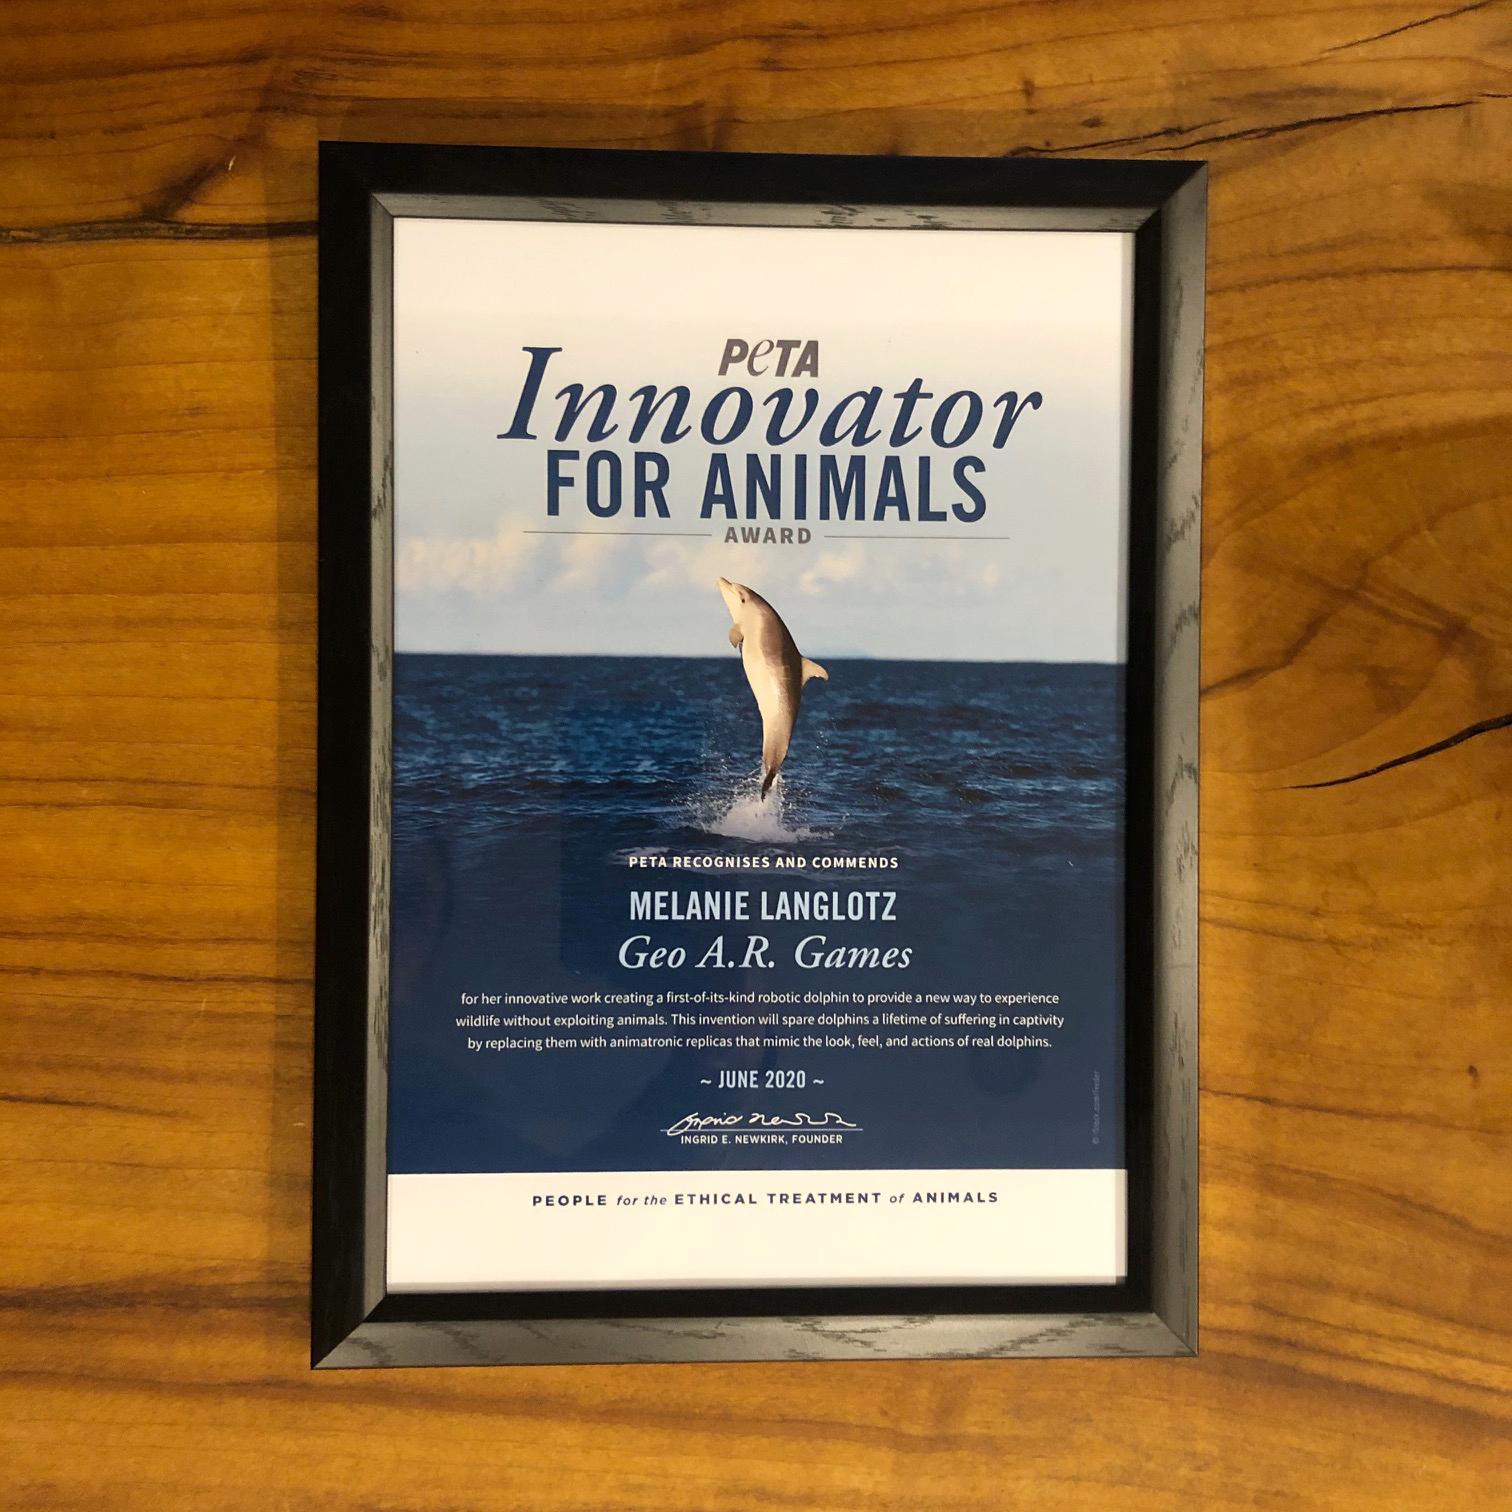 A framed Innovator For Animals Award.